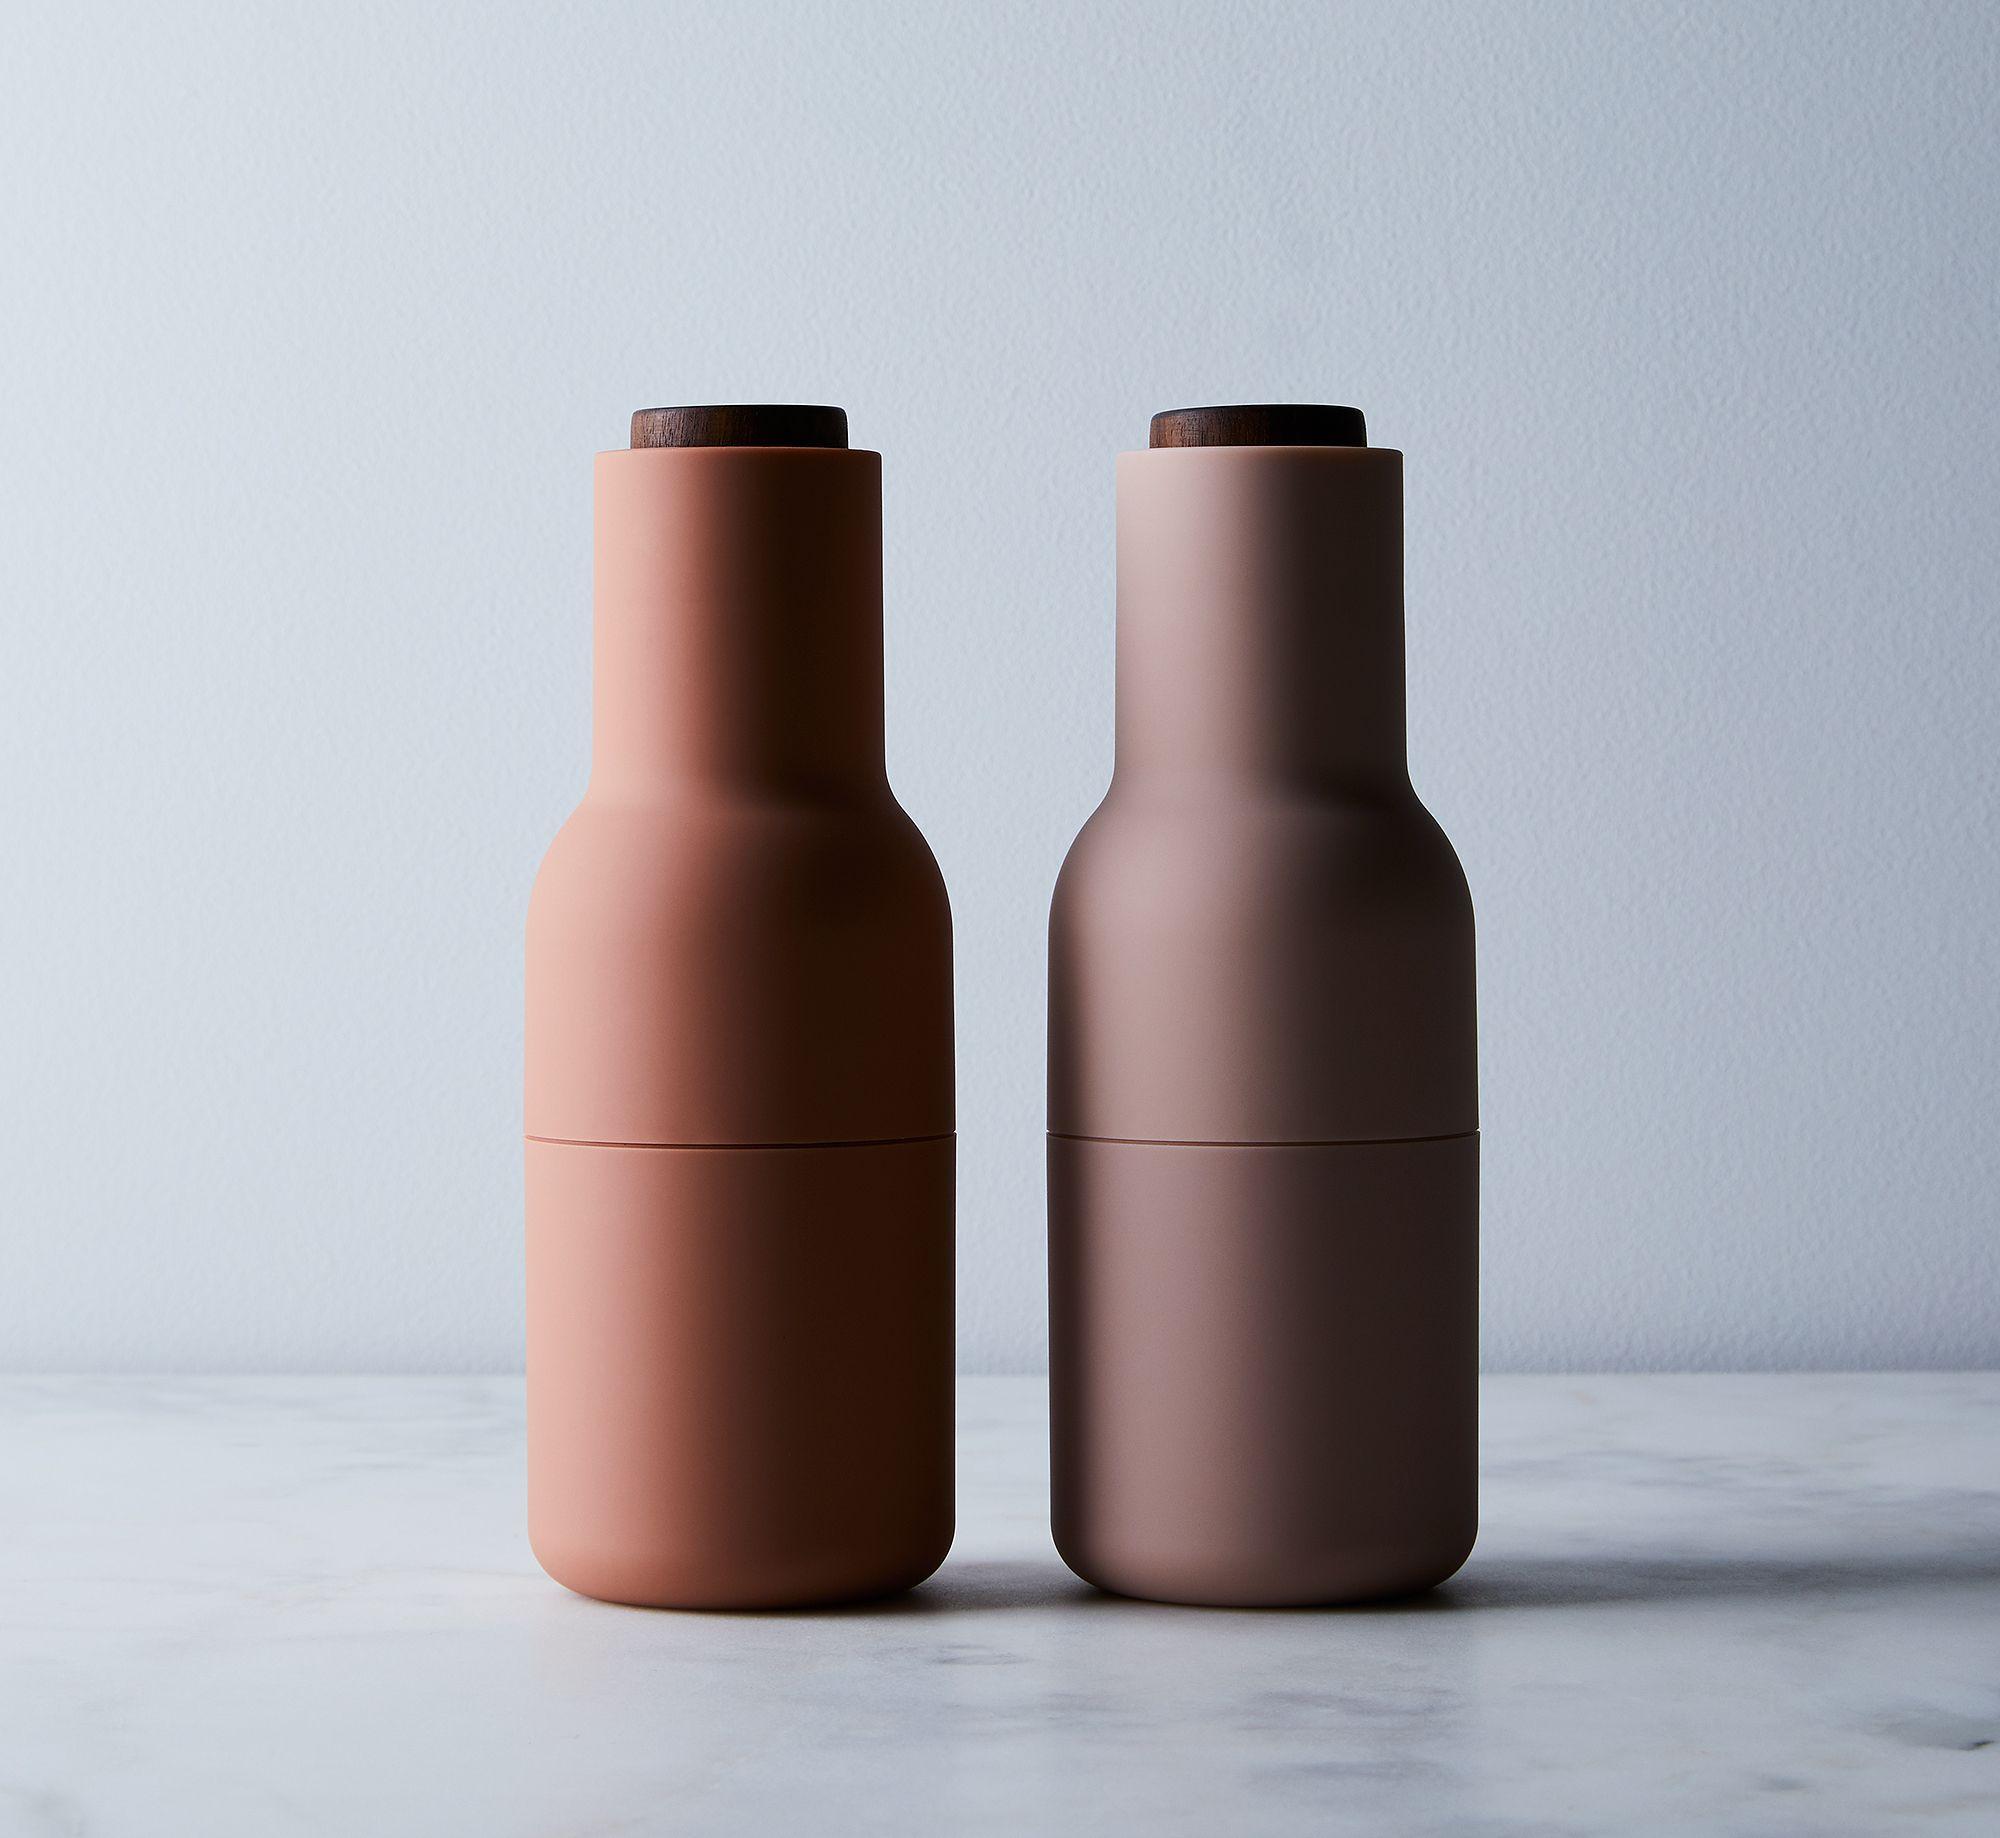 B1776c88 bb75 462a 8b6d ac5963d6a174  2017 1113 menu salt and pepper bottle grinders with walnut lids nudes greys silo ty mecham 003